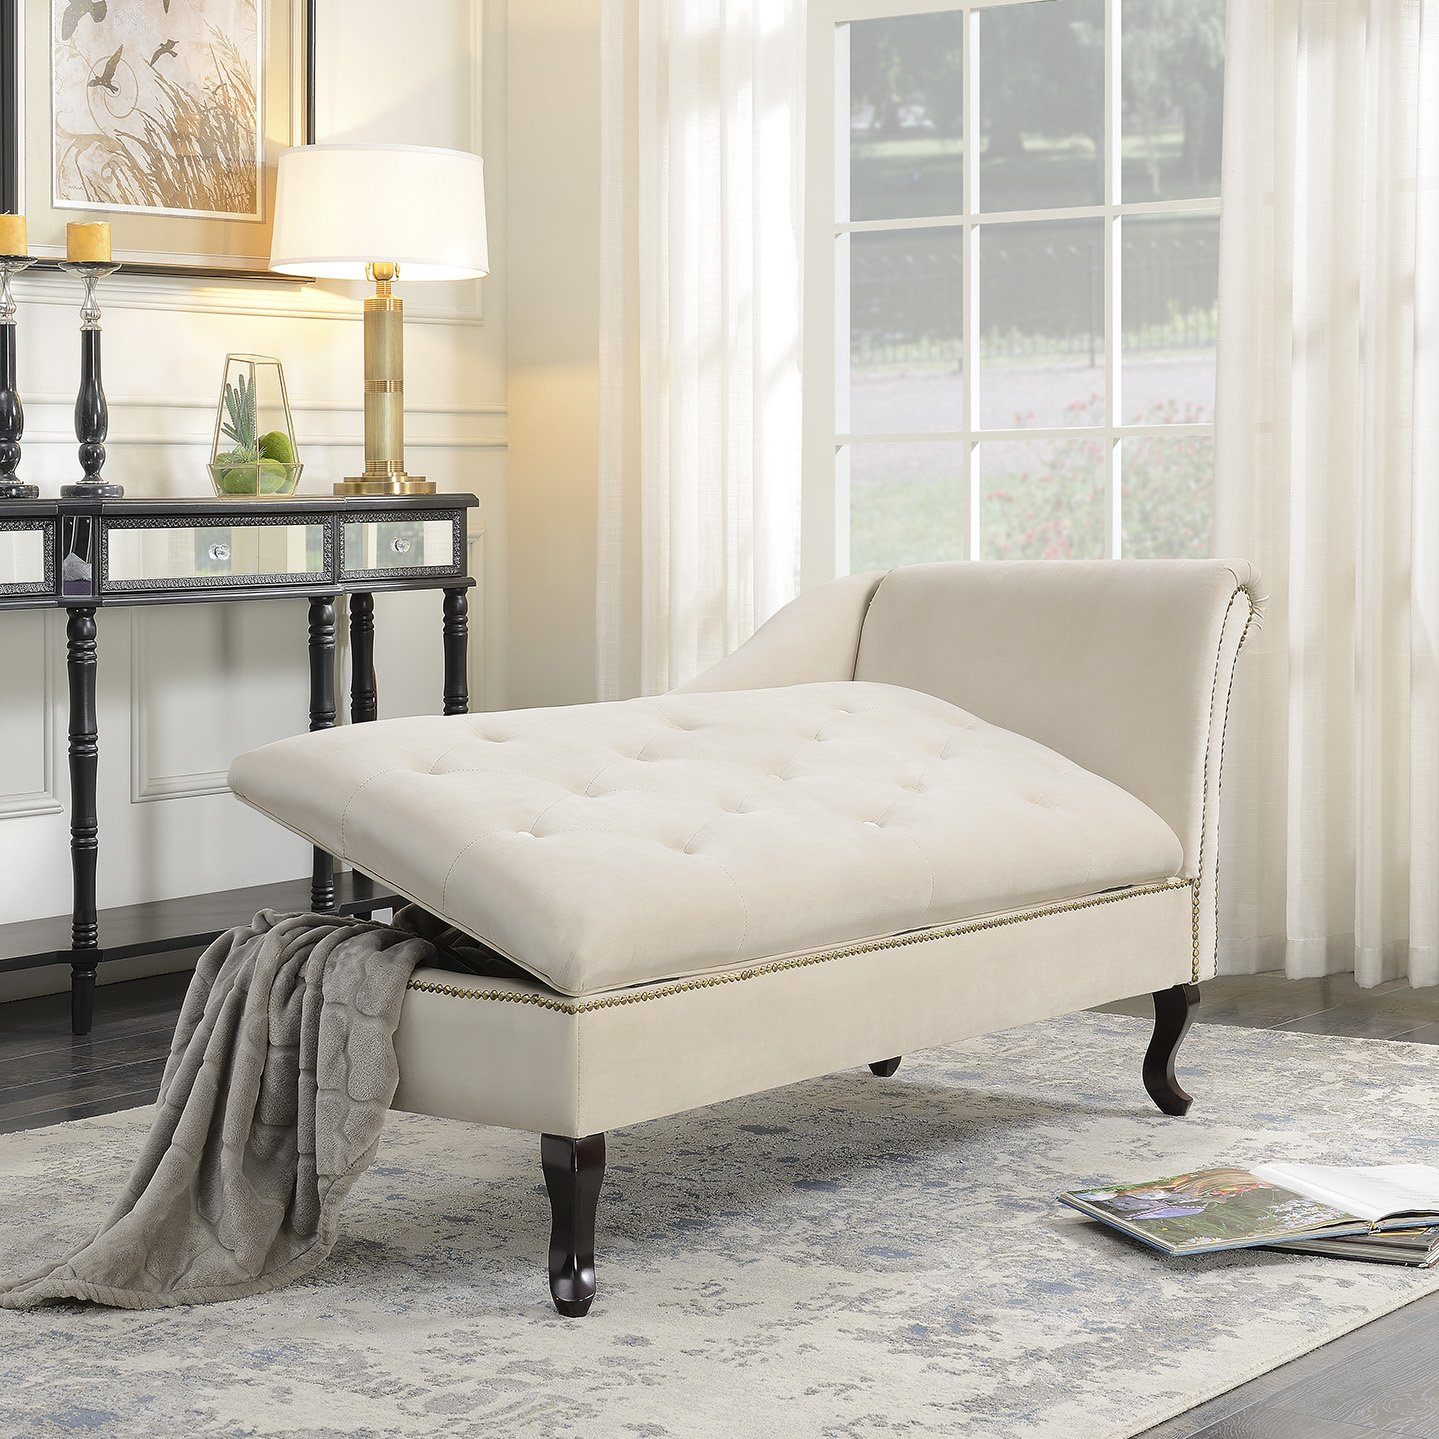 bedroom lounge chair amazon com rh amazon com lounge chair for bedroom cheap chaise lounge chair for bedroom